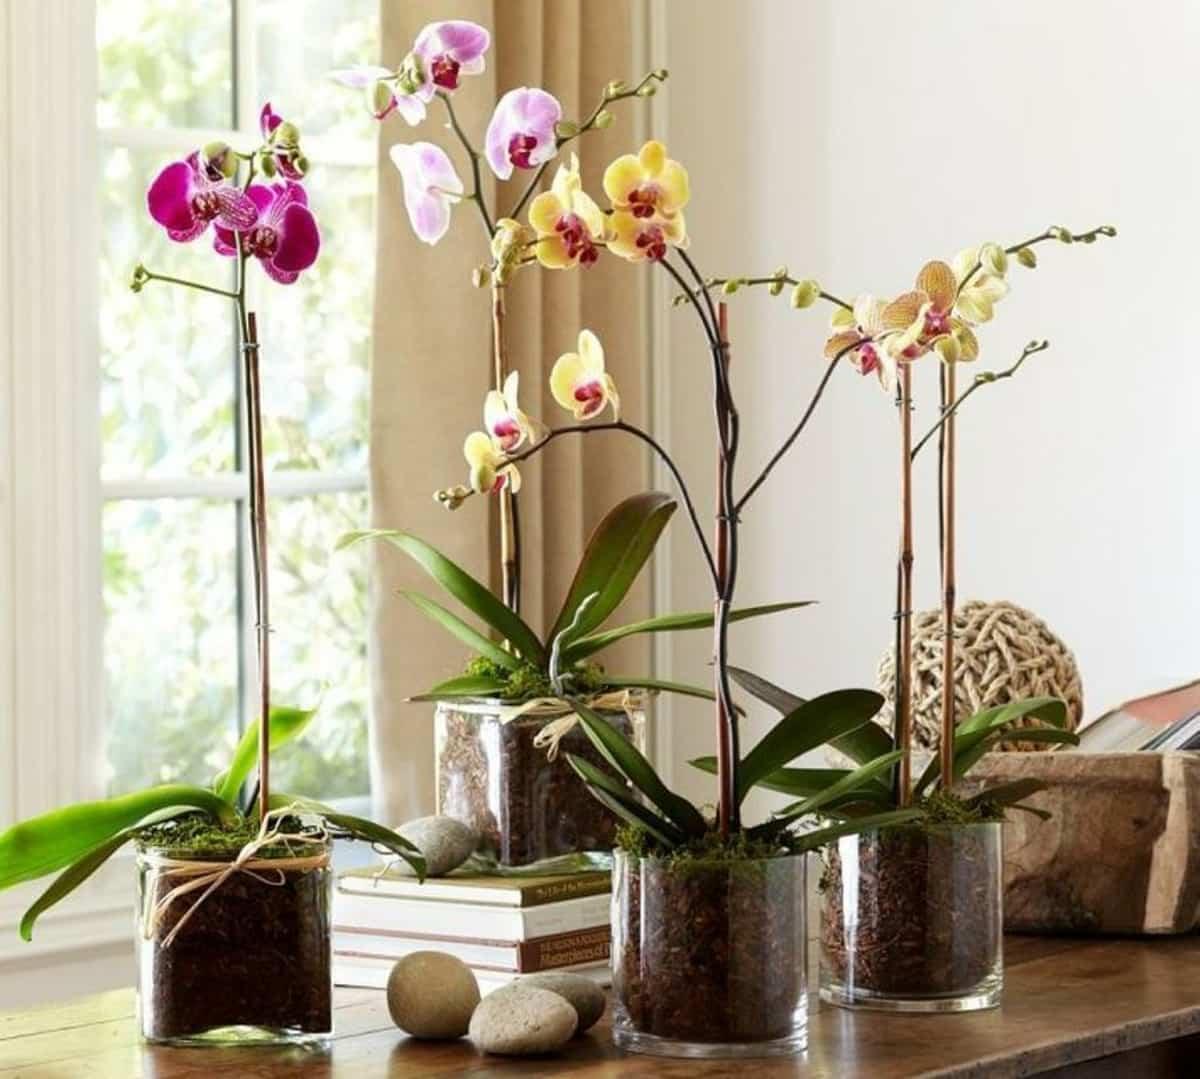 claves para decorar con orquideas tu hogar 9